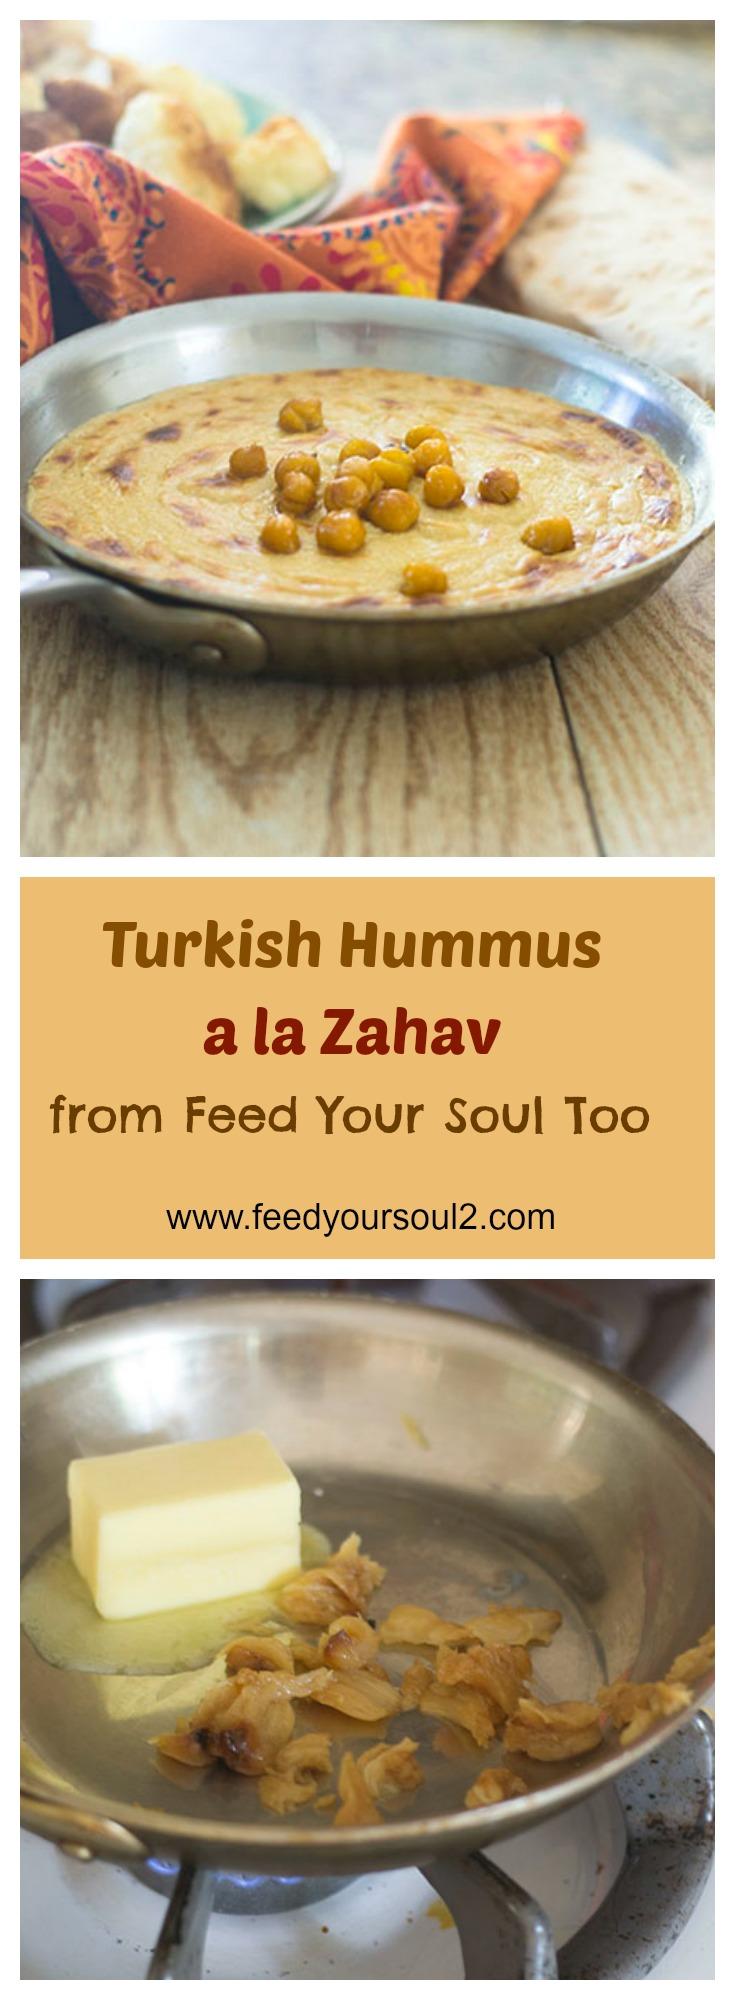 Turkish Hummus a la Zahav l #appetizer #vegetarian #middleeasternfood | feedyoursoul2.com